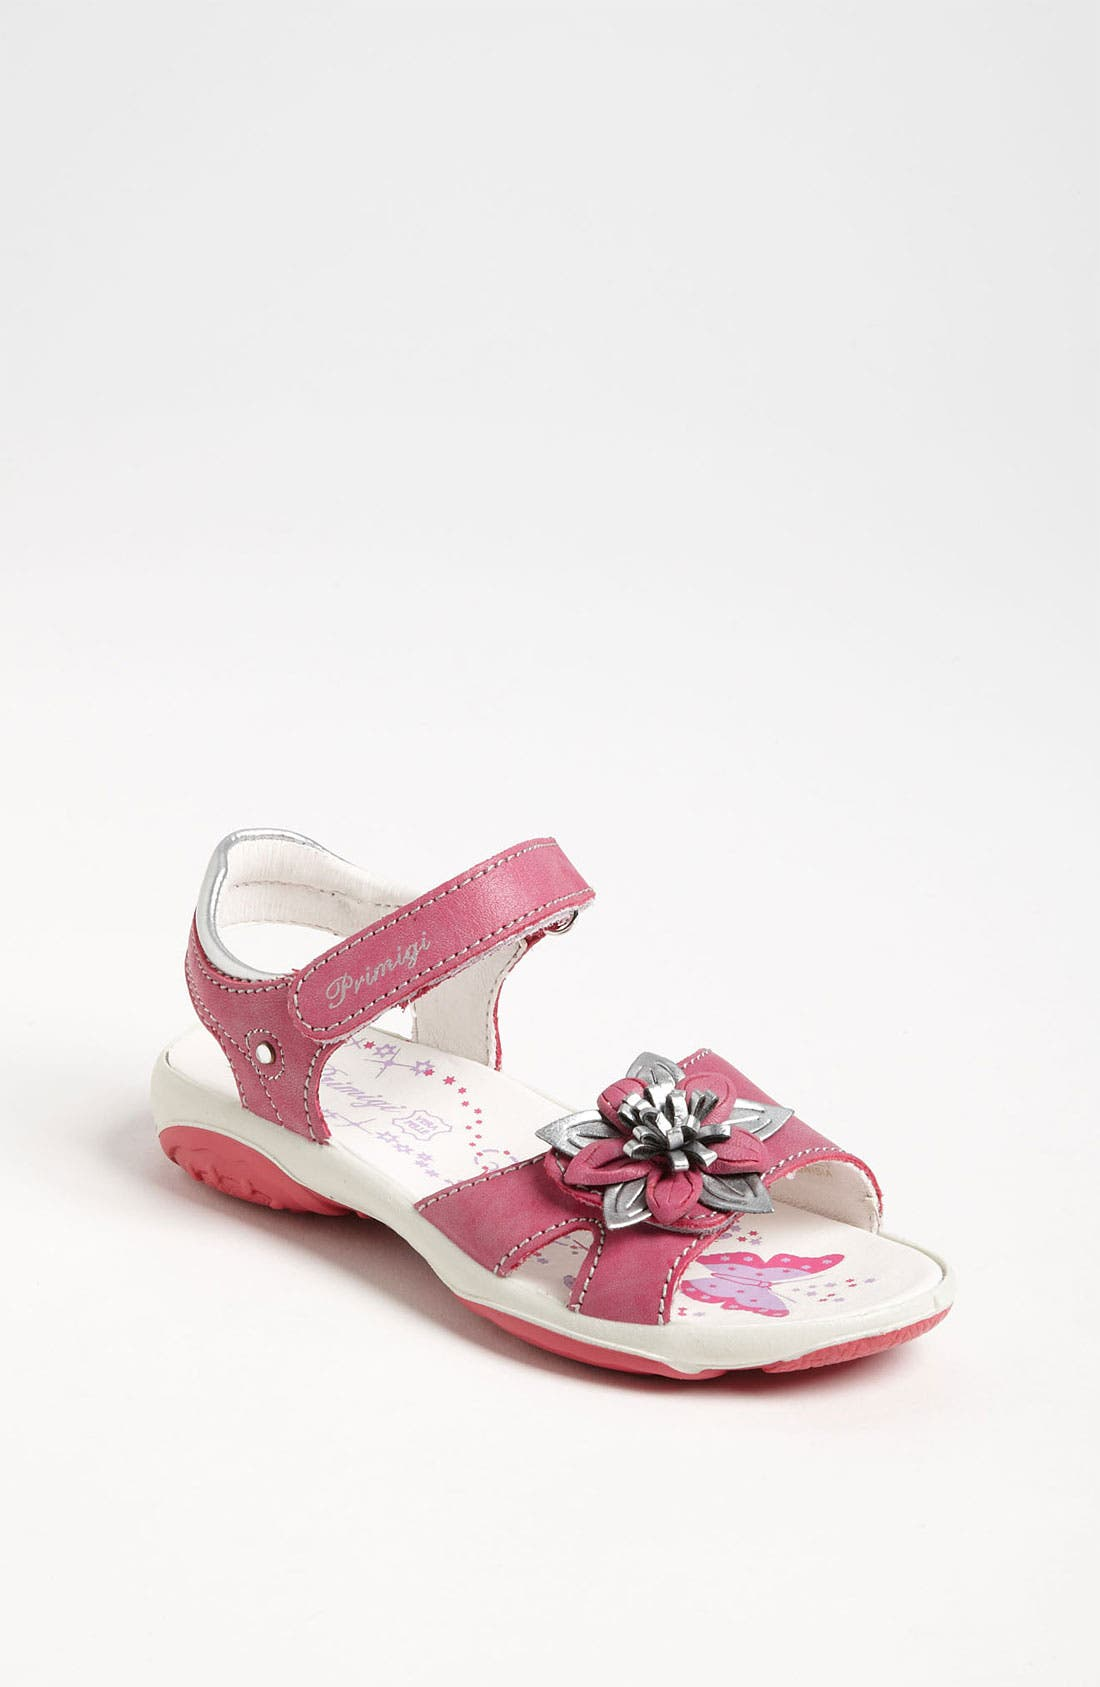 Alternate Image 1 Selected - Primigi 'Fata' Sandal (Toddler & Little Kid)